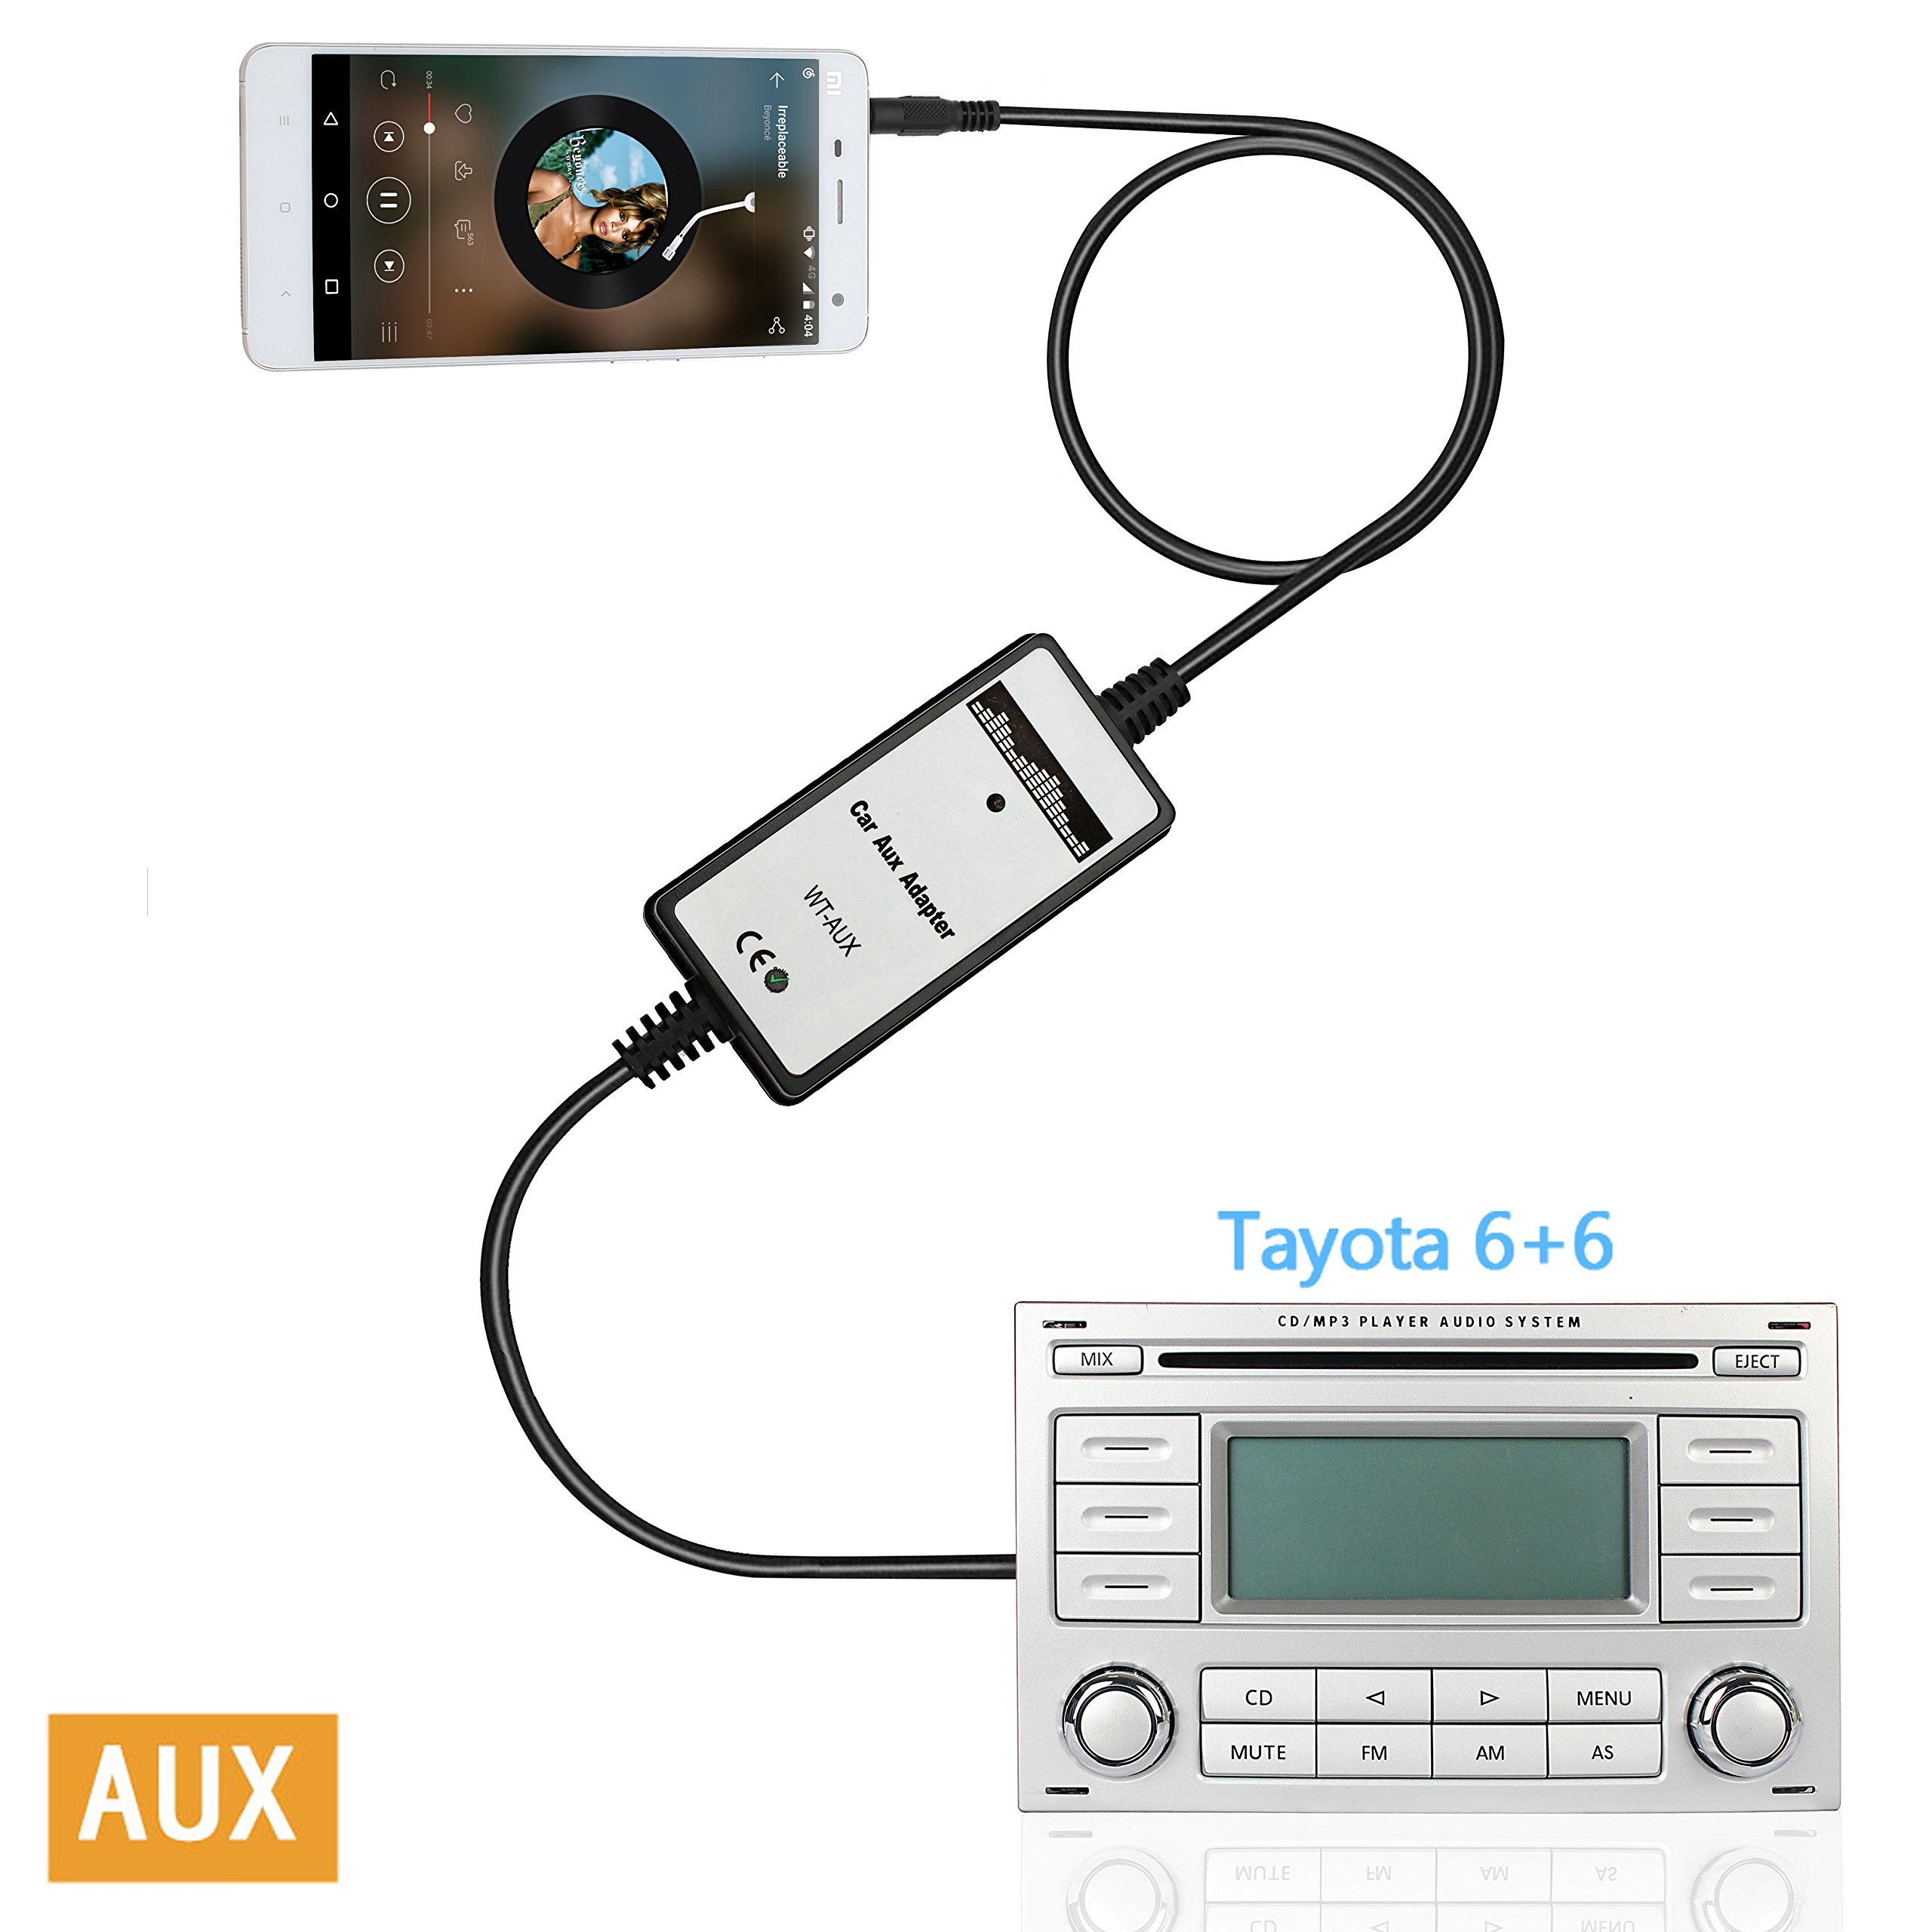 Moonet 3.5mm Audio Input Auxillary Aux Adapter Stereo Radio For 2003-UP Toyota 4Runner Avalon Camry Celica Corolla Yaris FJ Cruiser Highlander Landcruiser Matrix MR2 Tacoma Tundra Venza Vitz